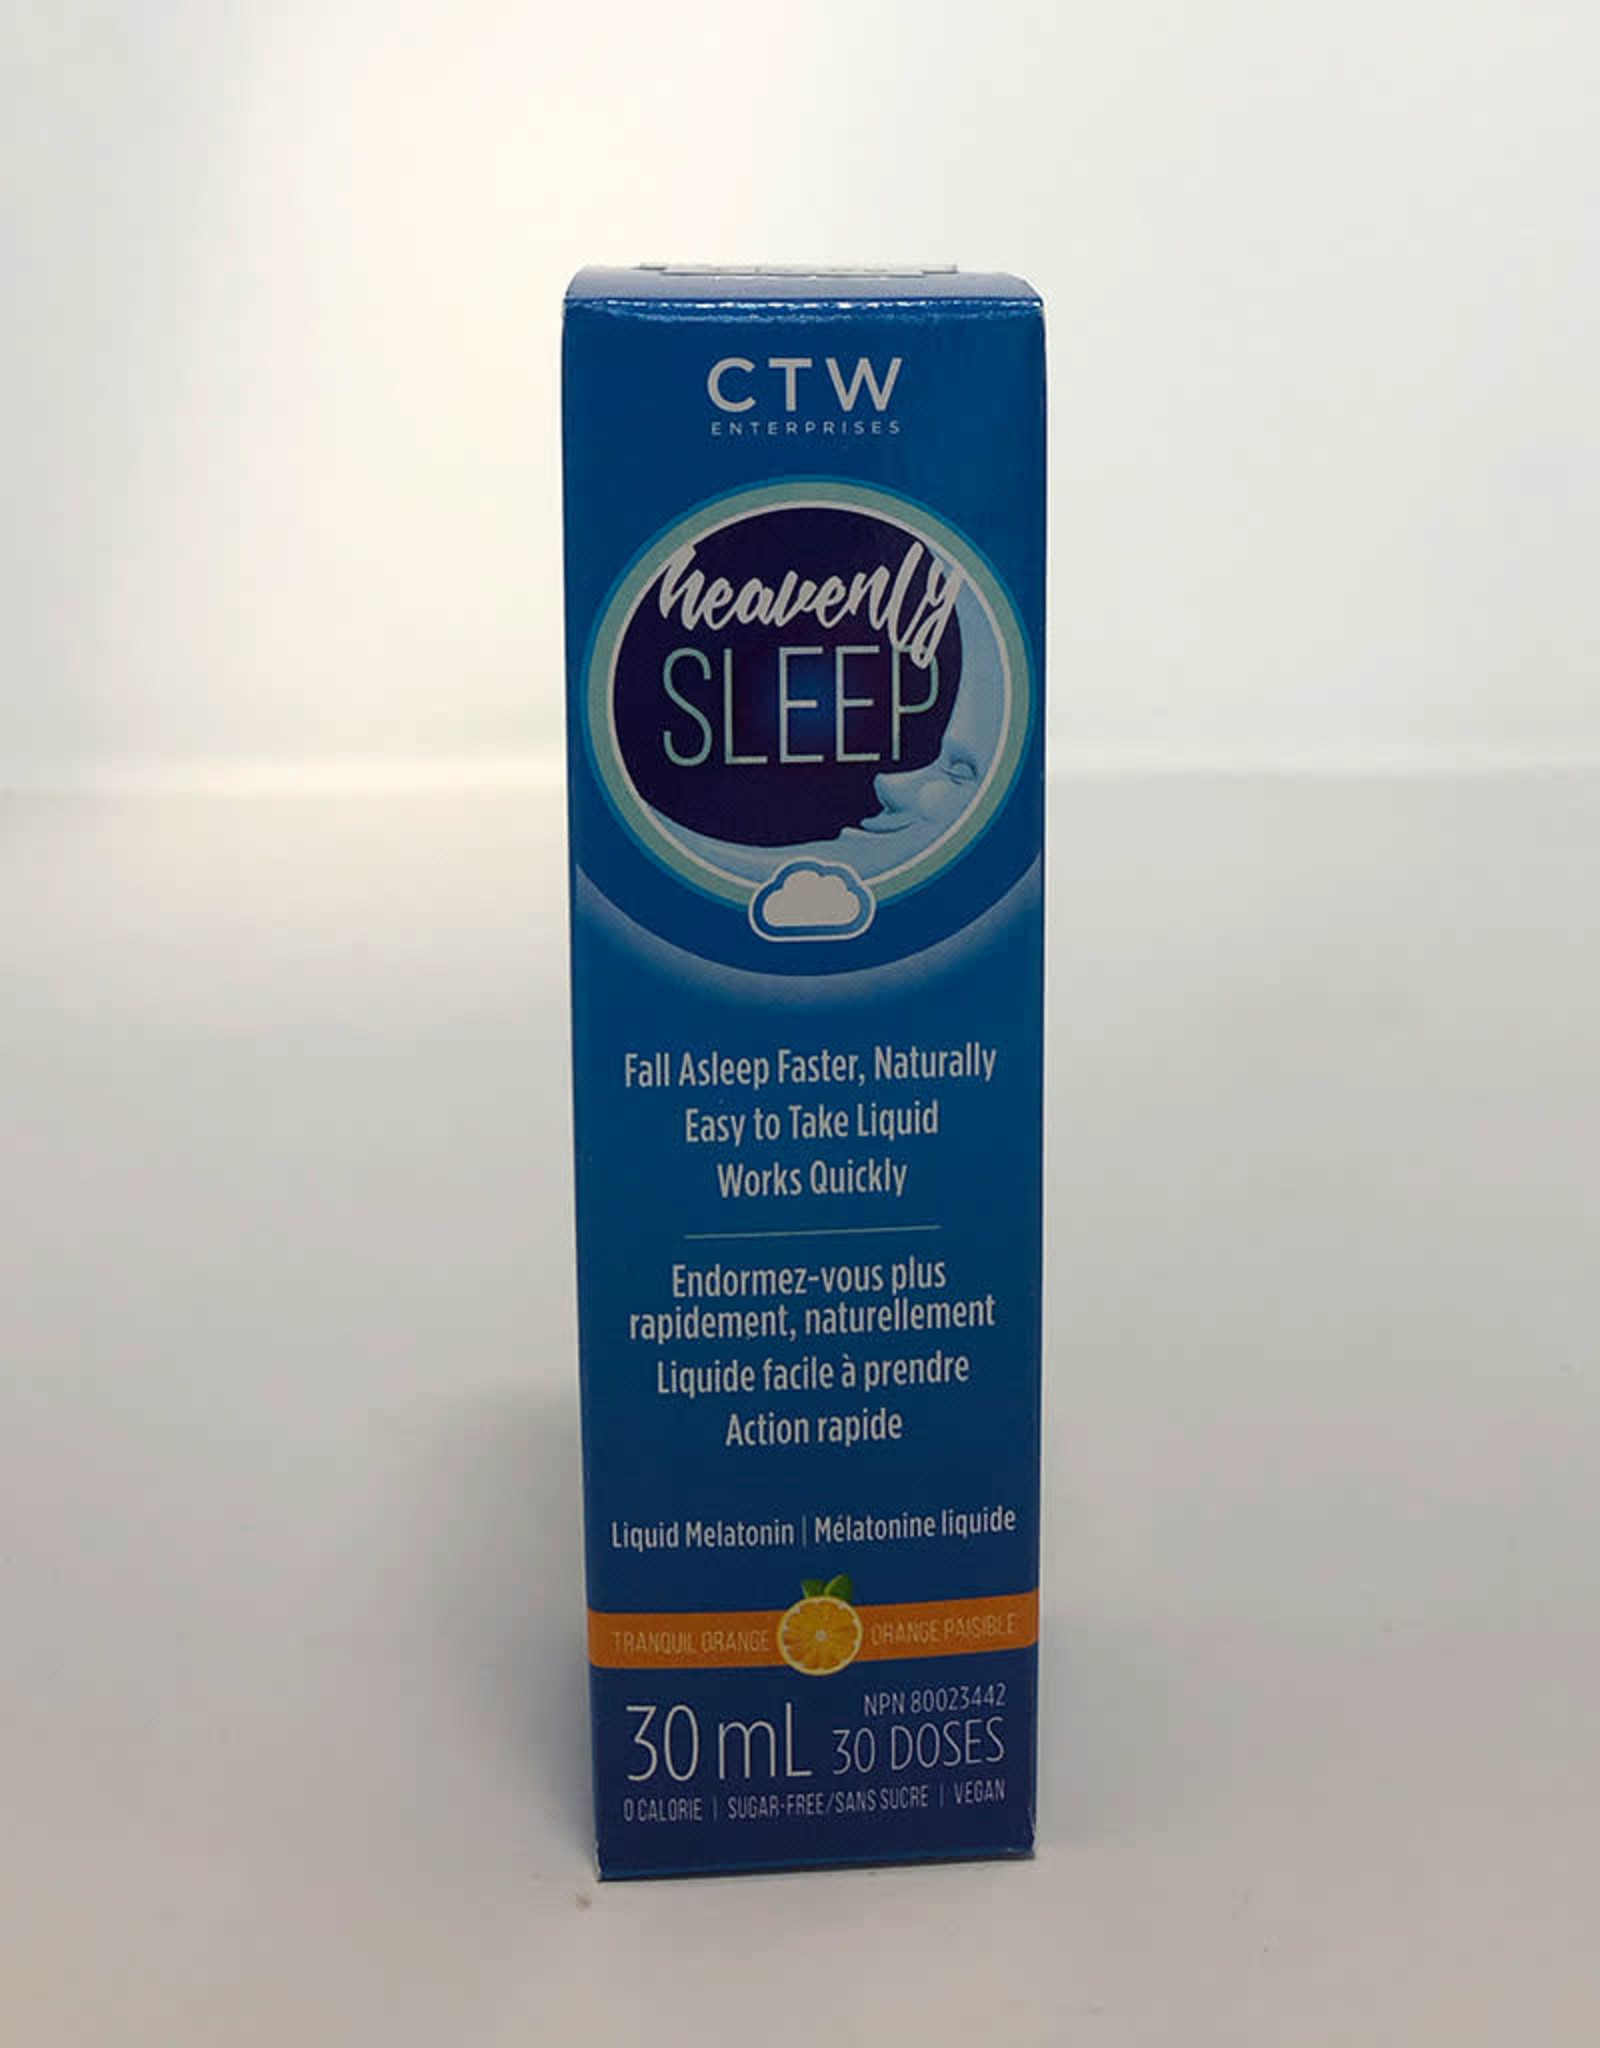 Naturally Calm Natural Calm - Heavenly Sleep Liquid Melatonin (30ml)